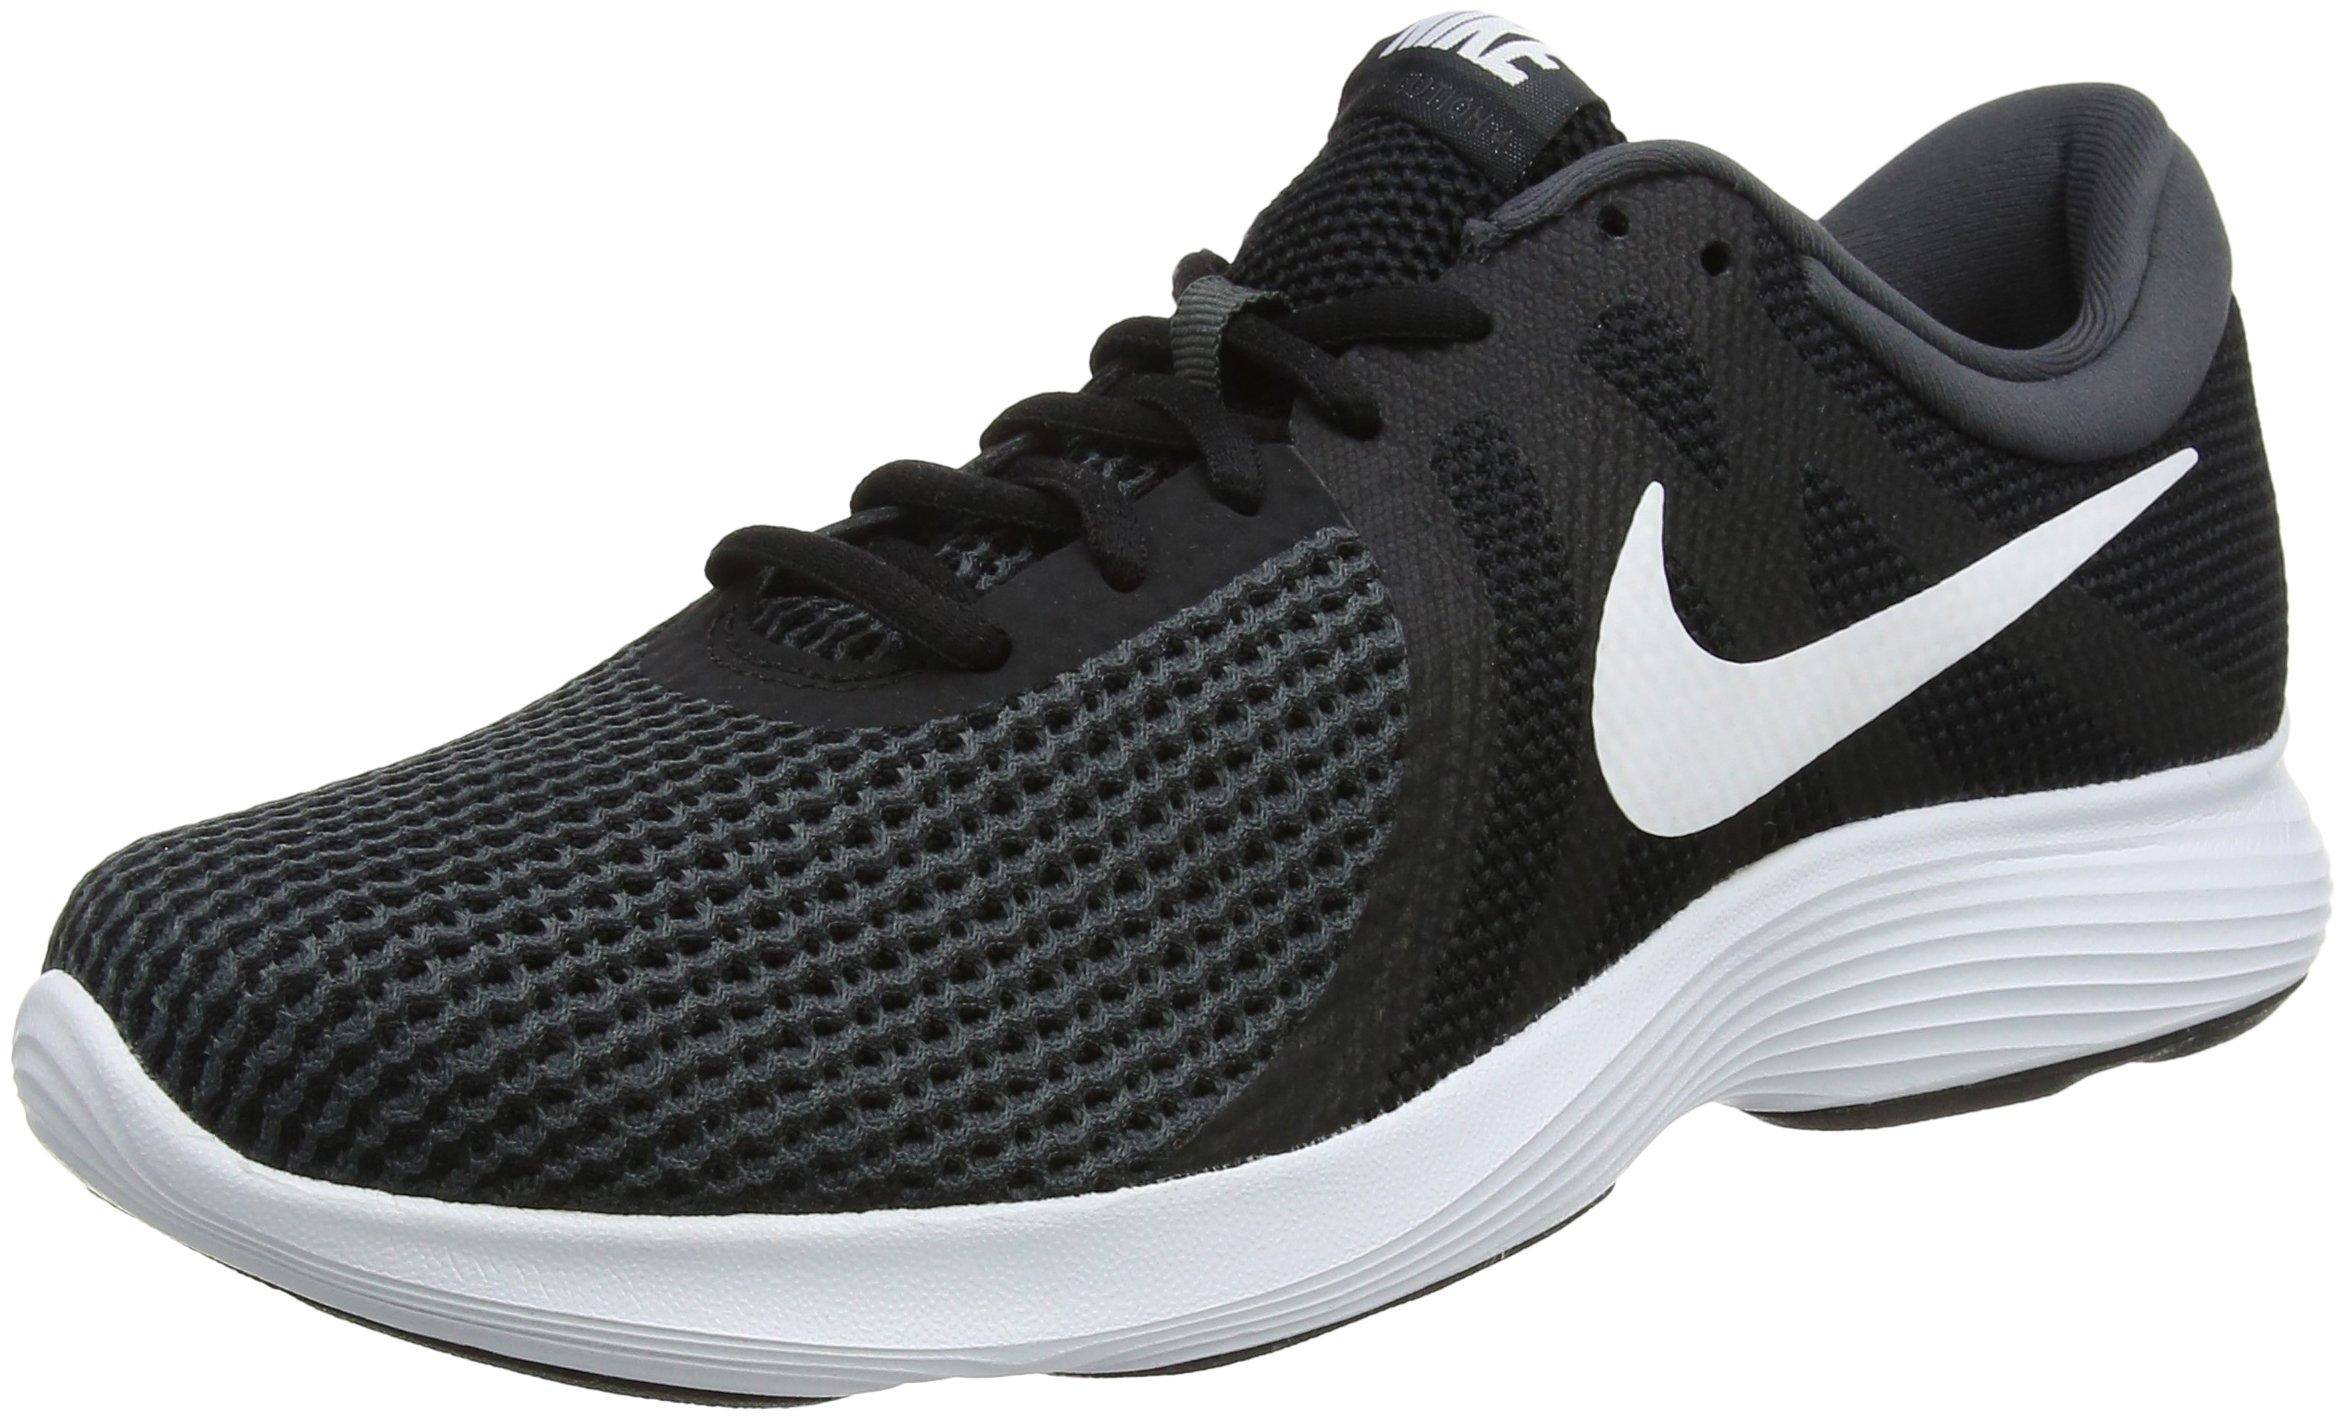 5 Chaussures Nike Revolution white Compétition Running 00149 Eu De 4 HommeNoirblack anthracite wOn0Pk